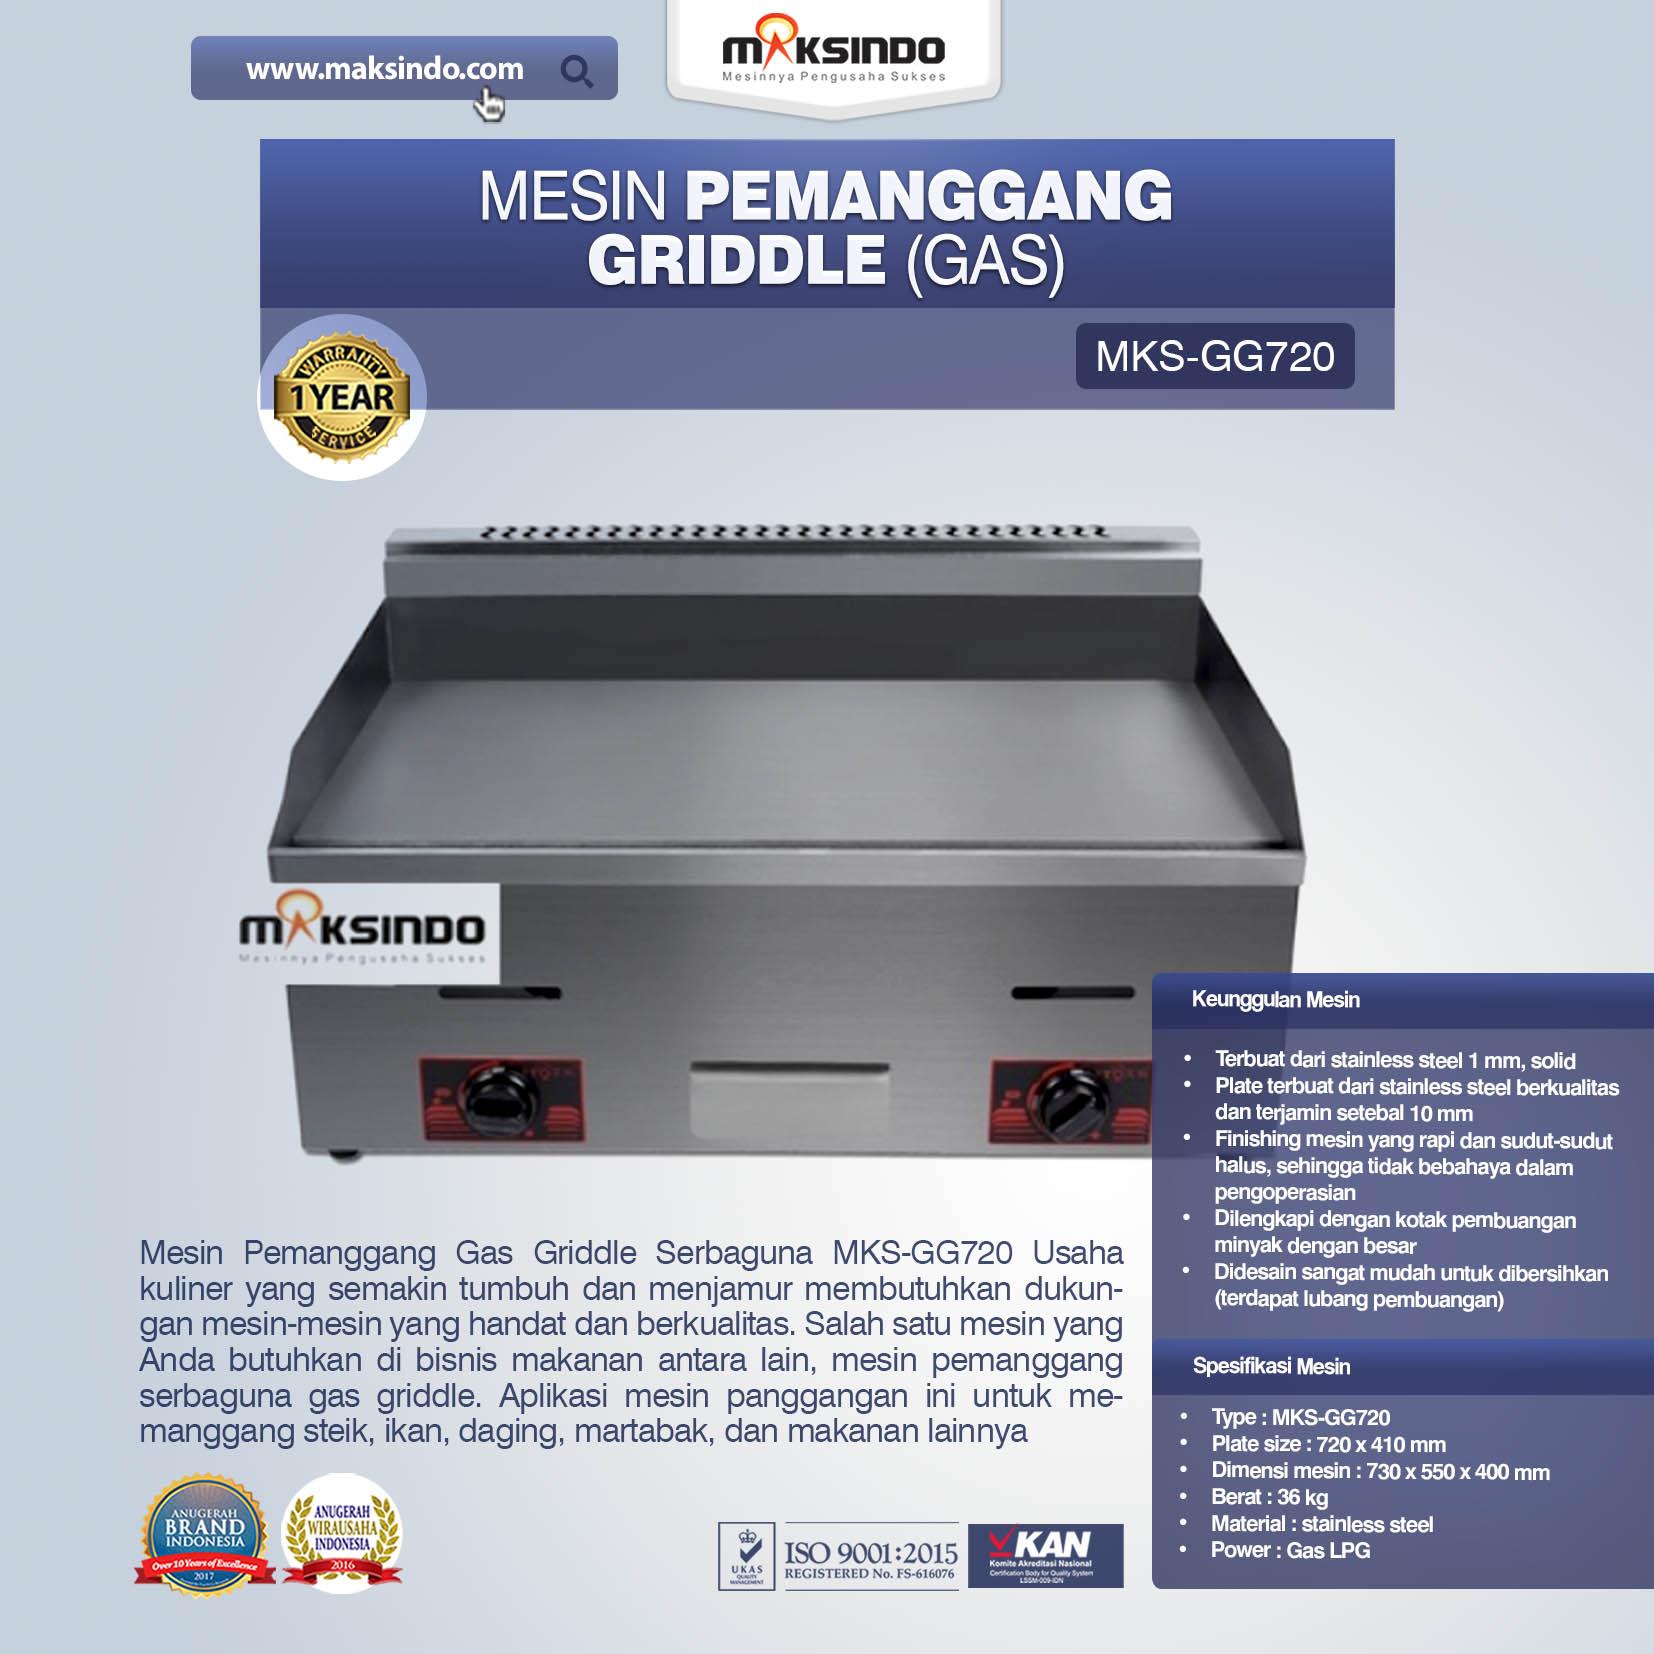 Jual Mesin Pemanggang Griddle (Gas) – GG720 di Bandung